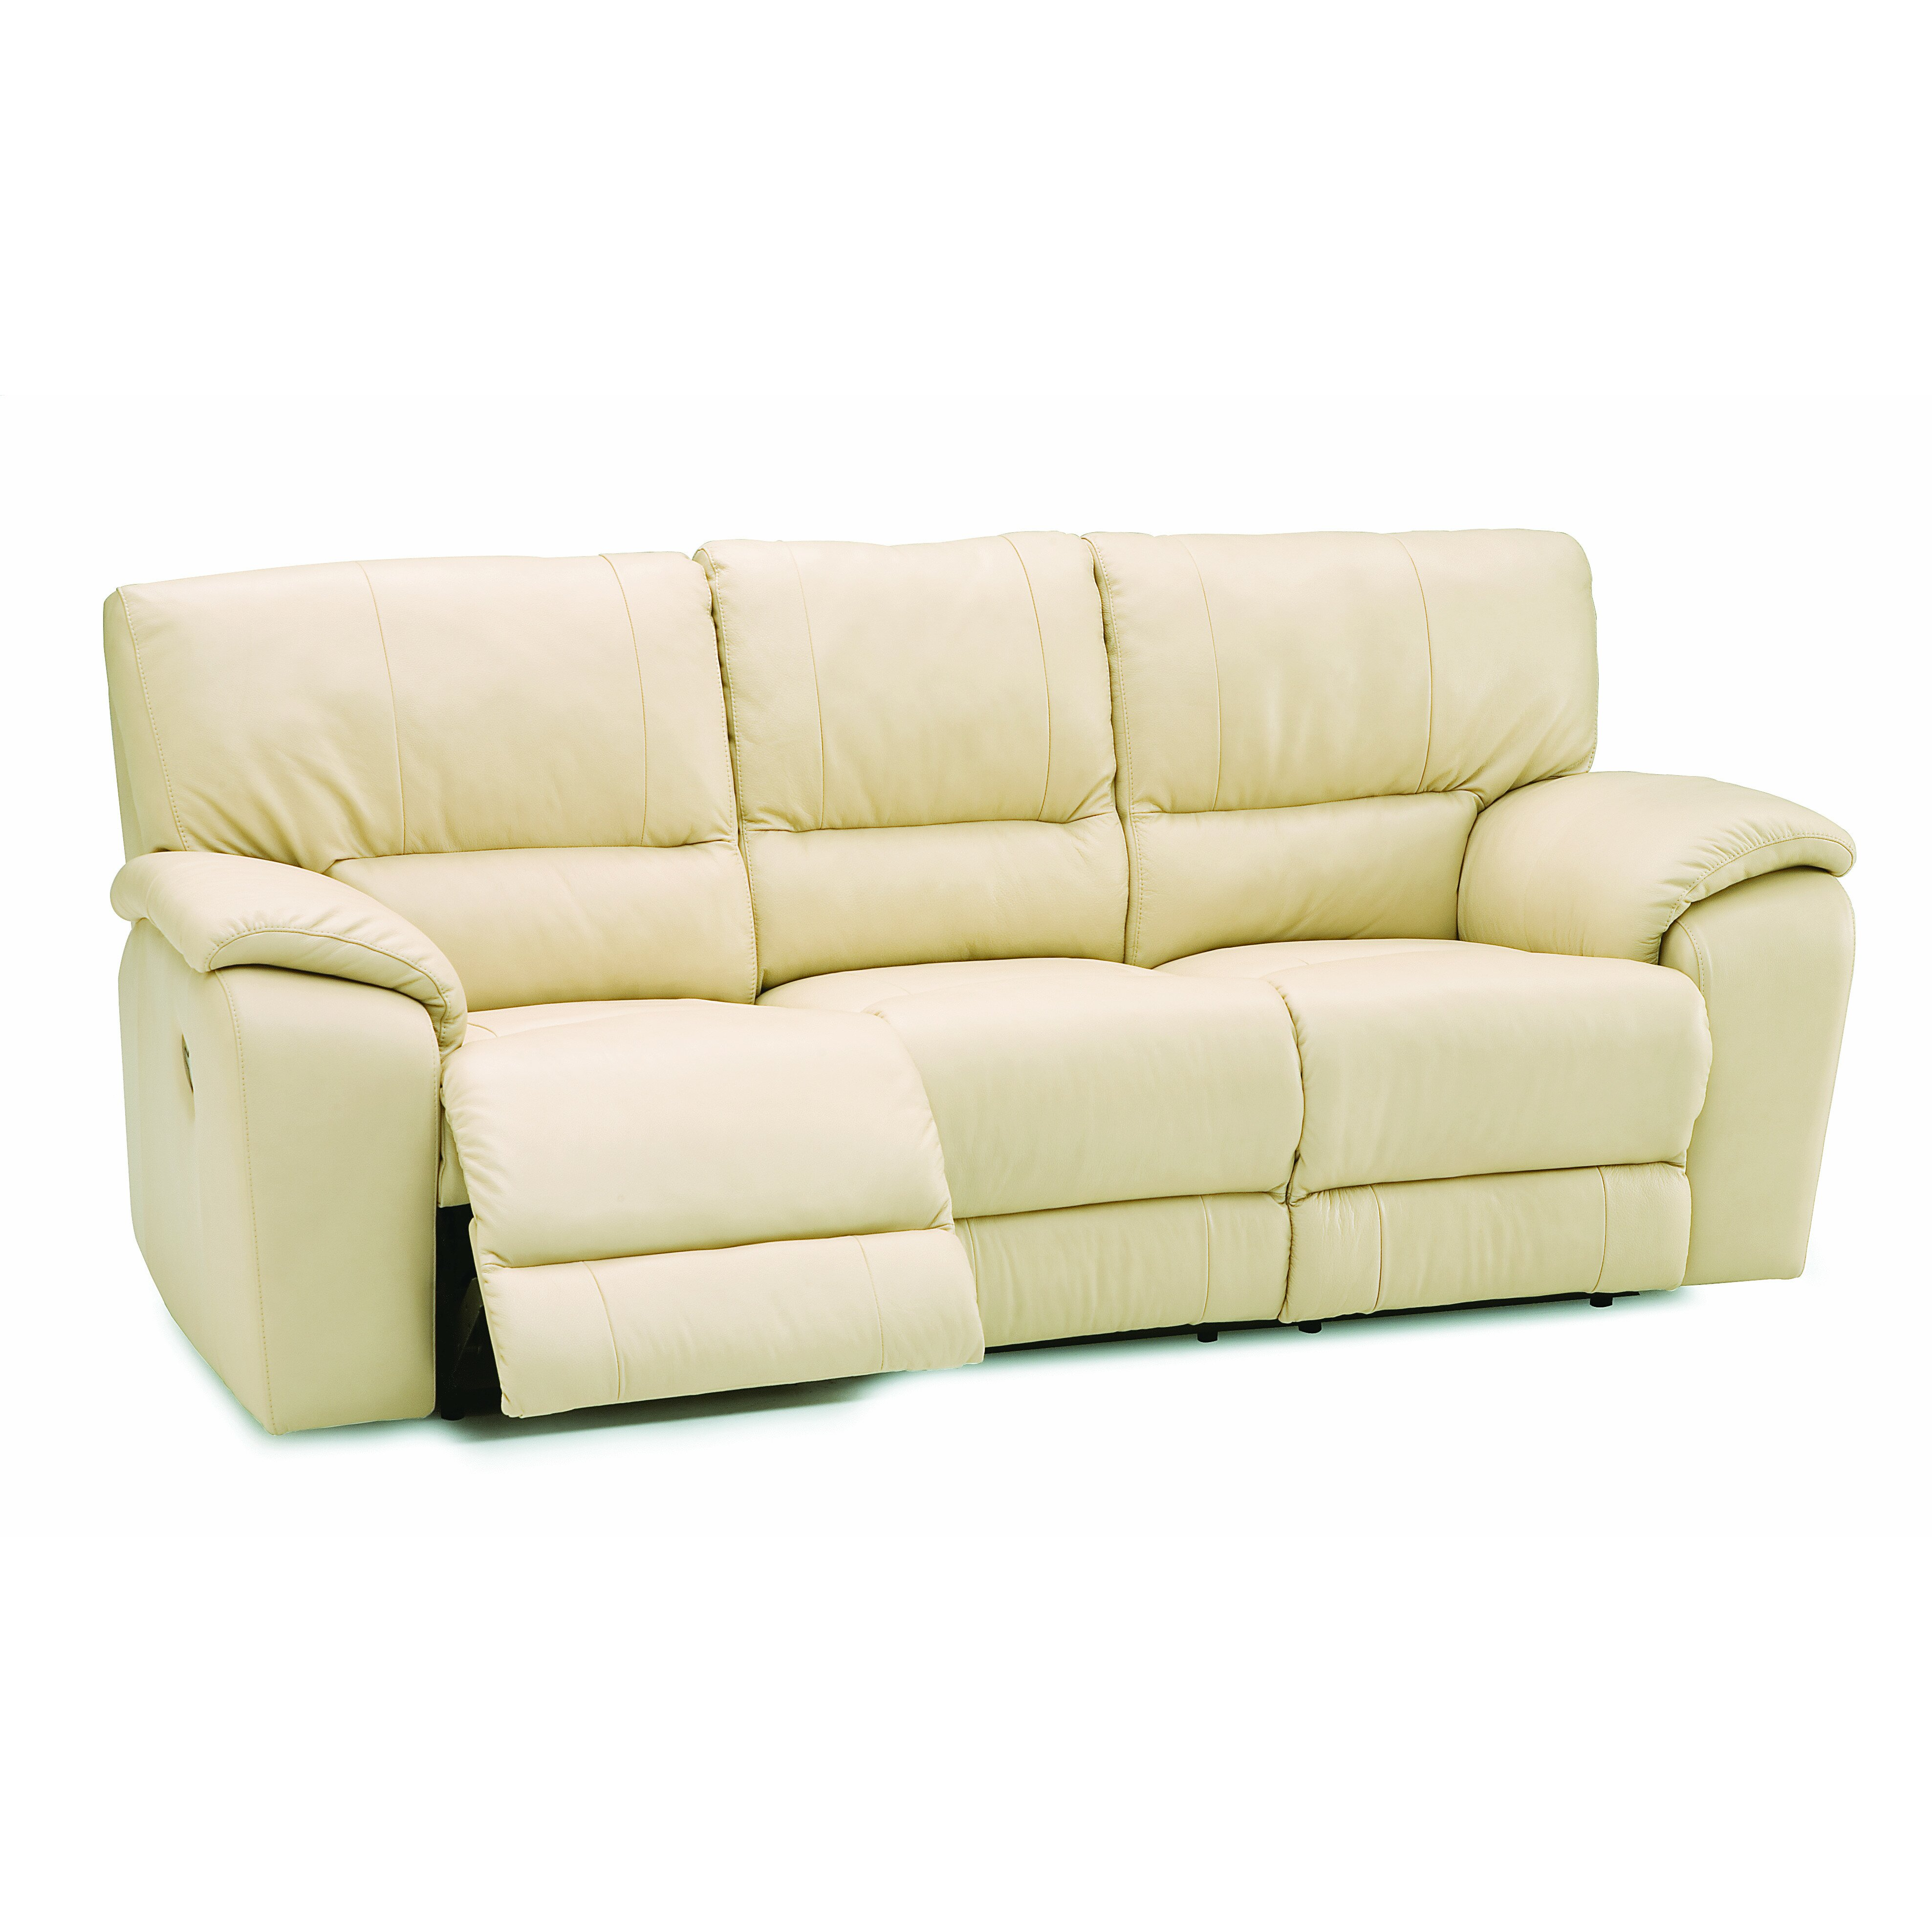 Palliser Furniture Quality Reviews